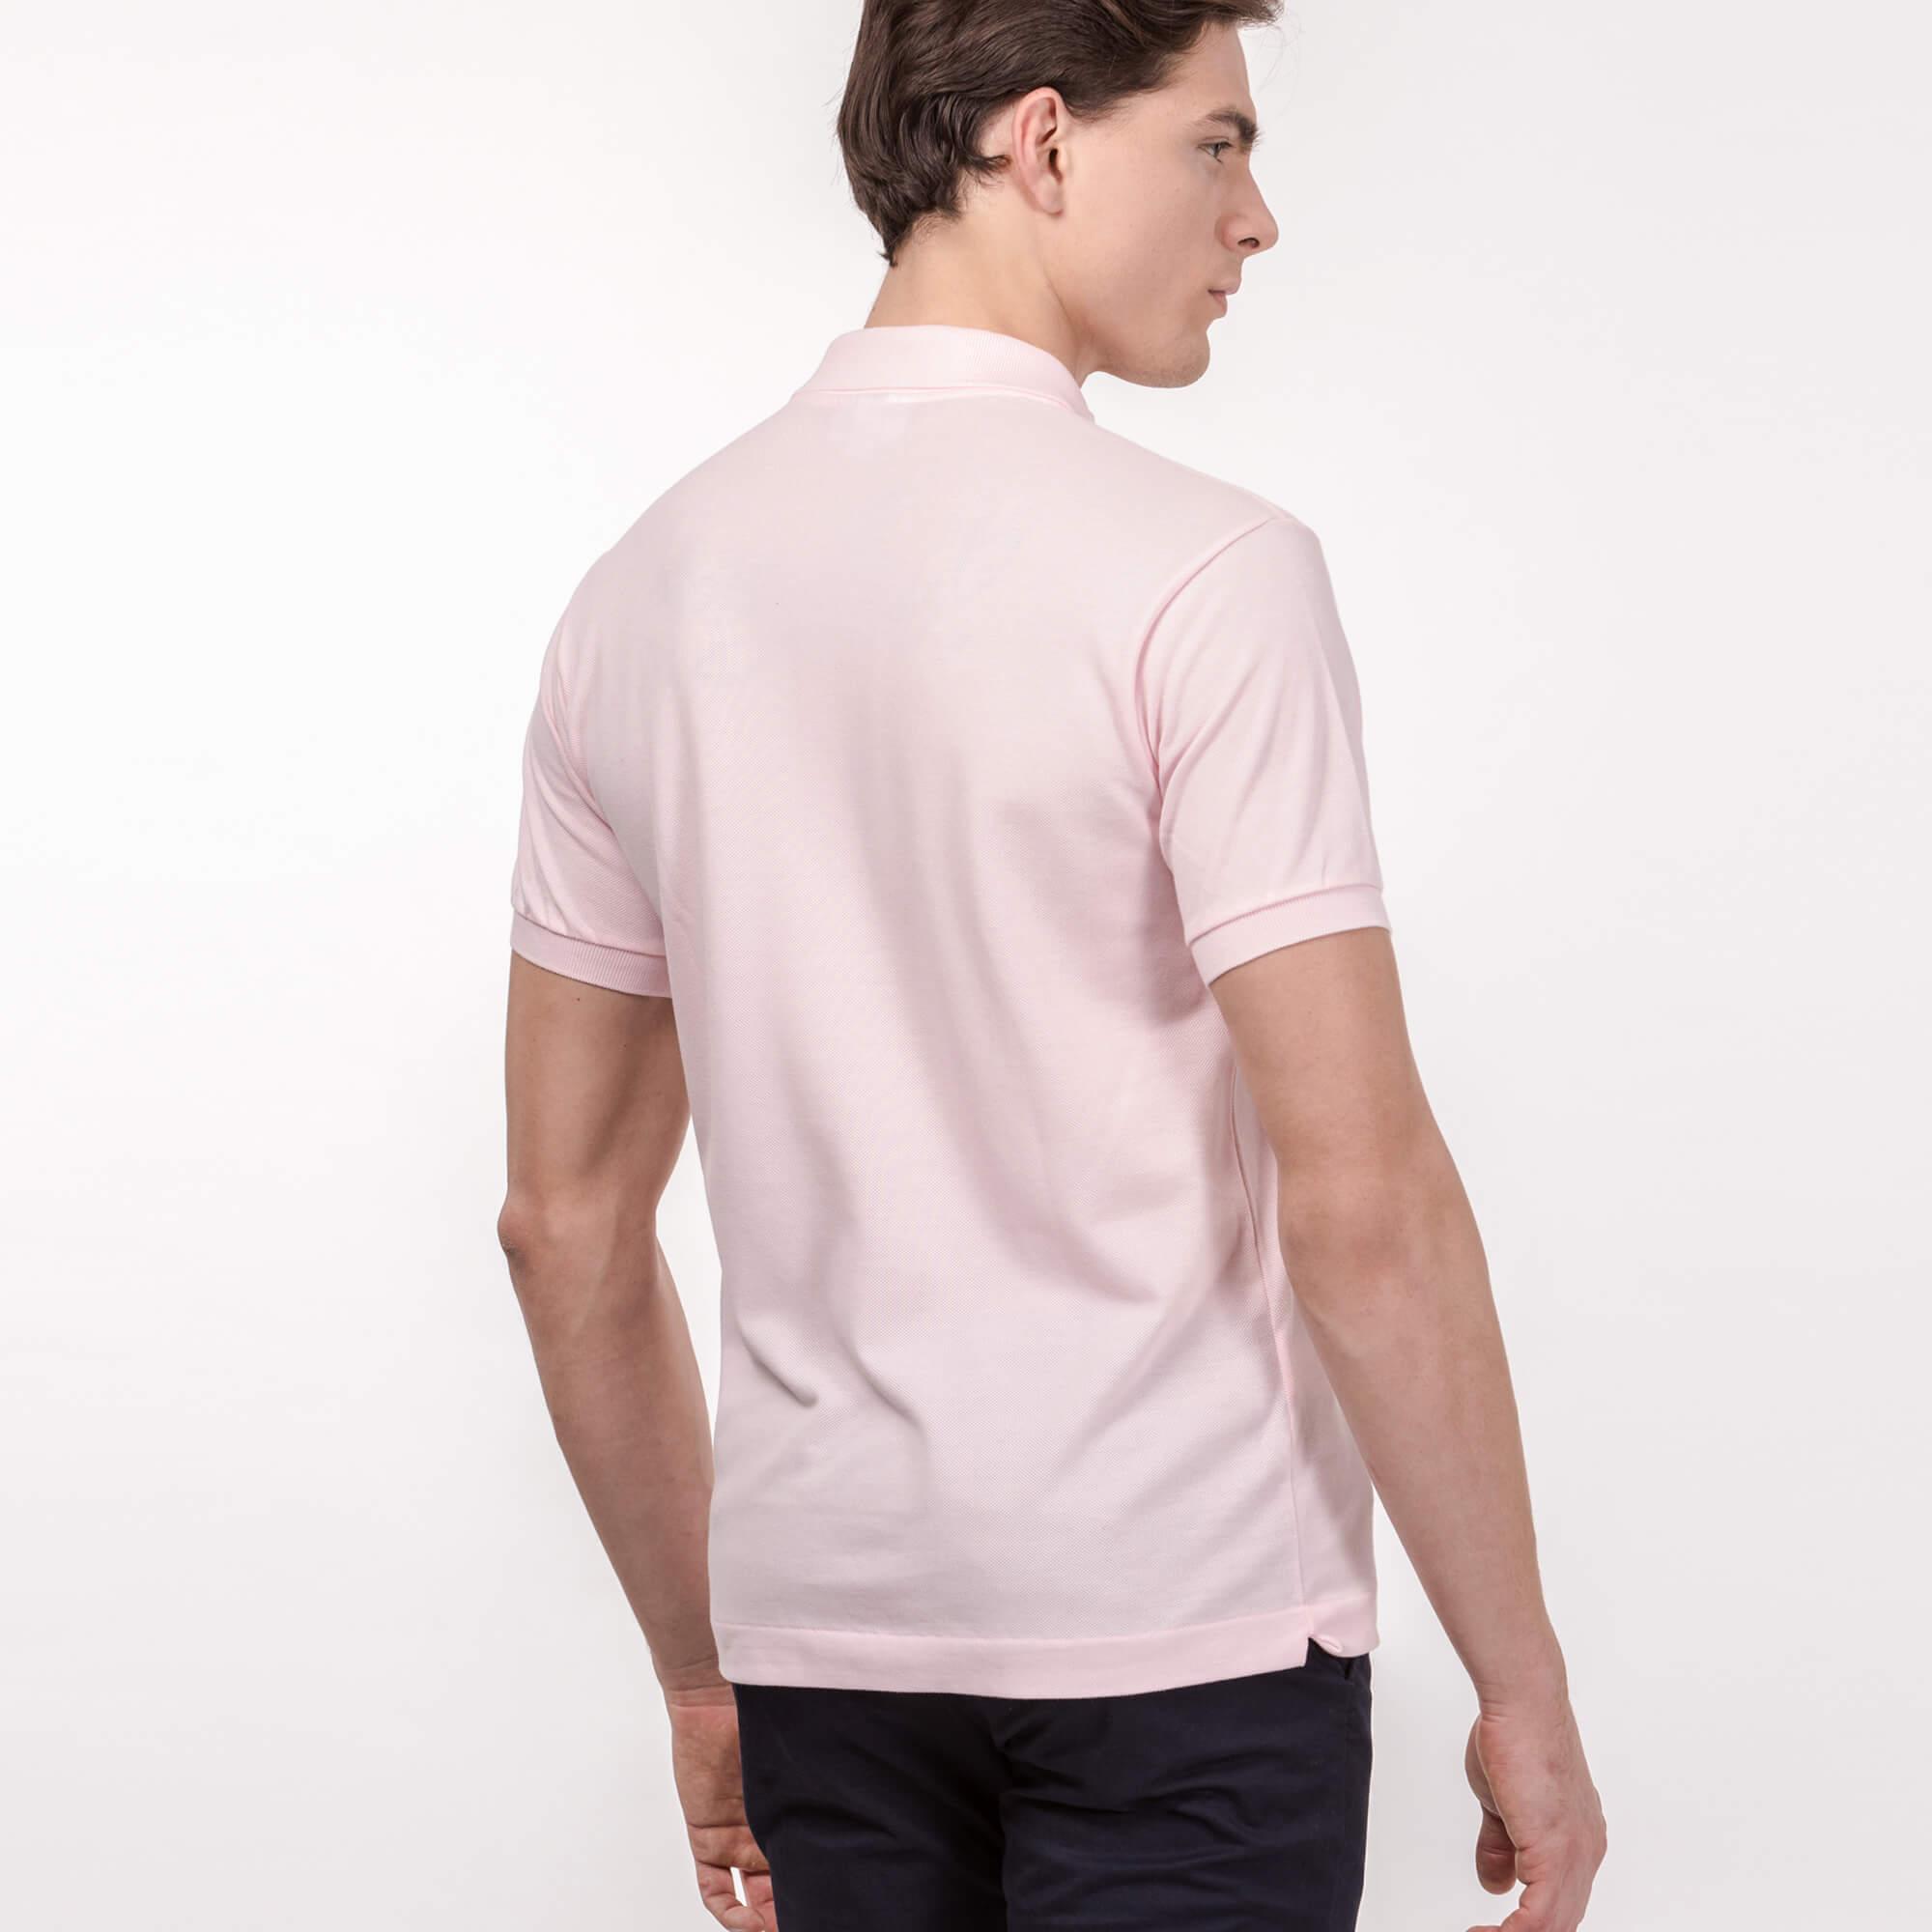 Lacoste Lacoste Classic Fit L.12.12 Polo Shirt